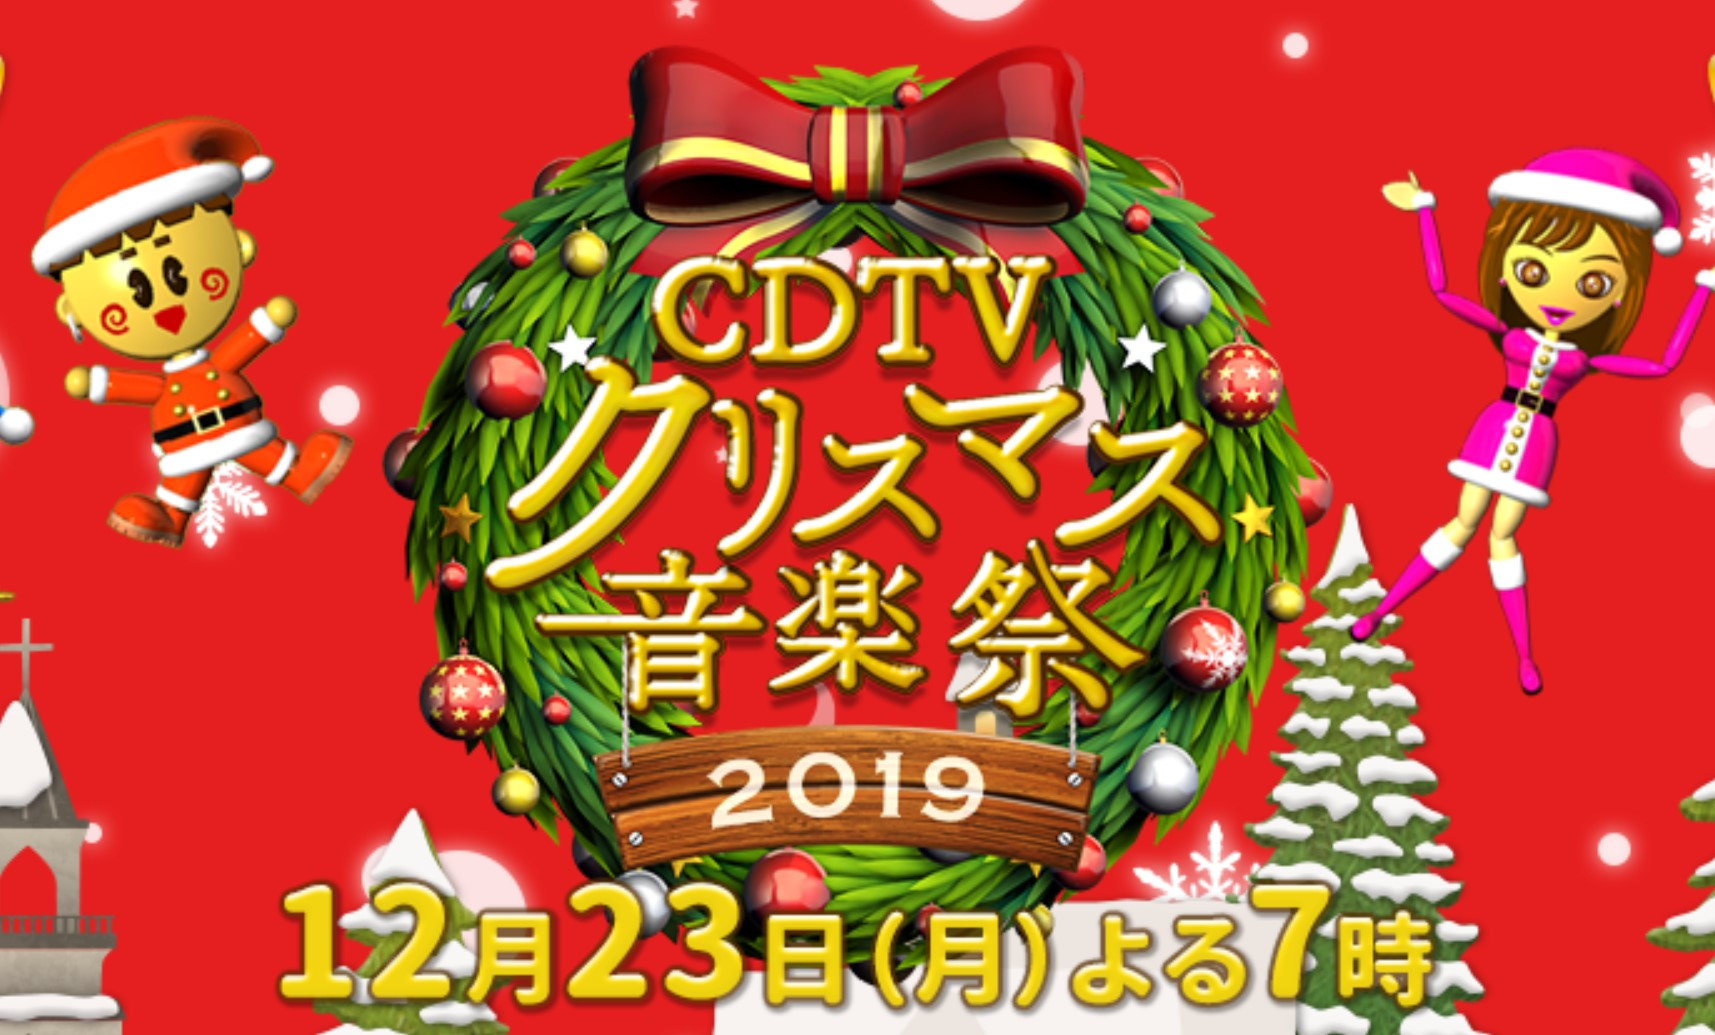 CDTVクリスマス音楽祭2019観覧倍率予想!当選確率上げる方法と当落結果も